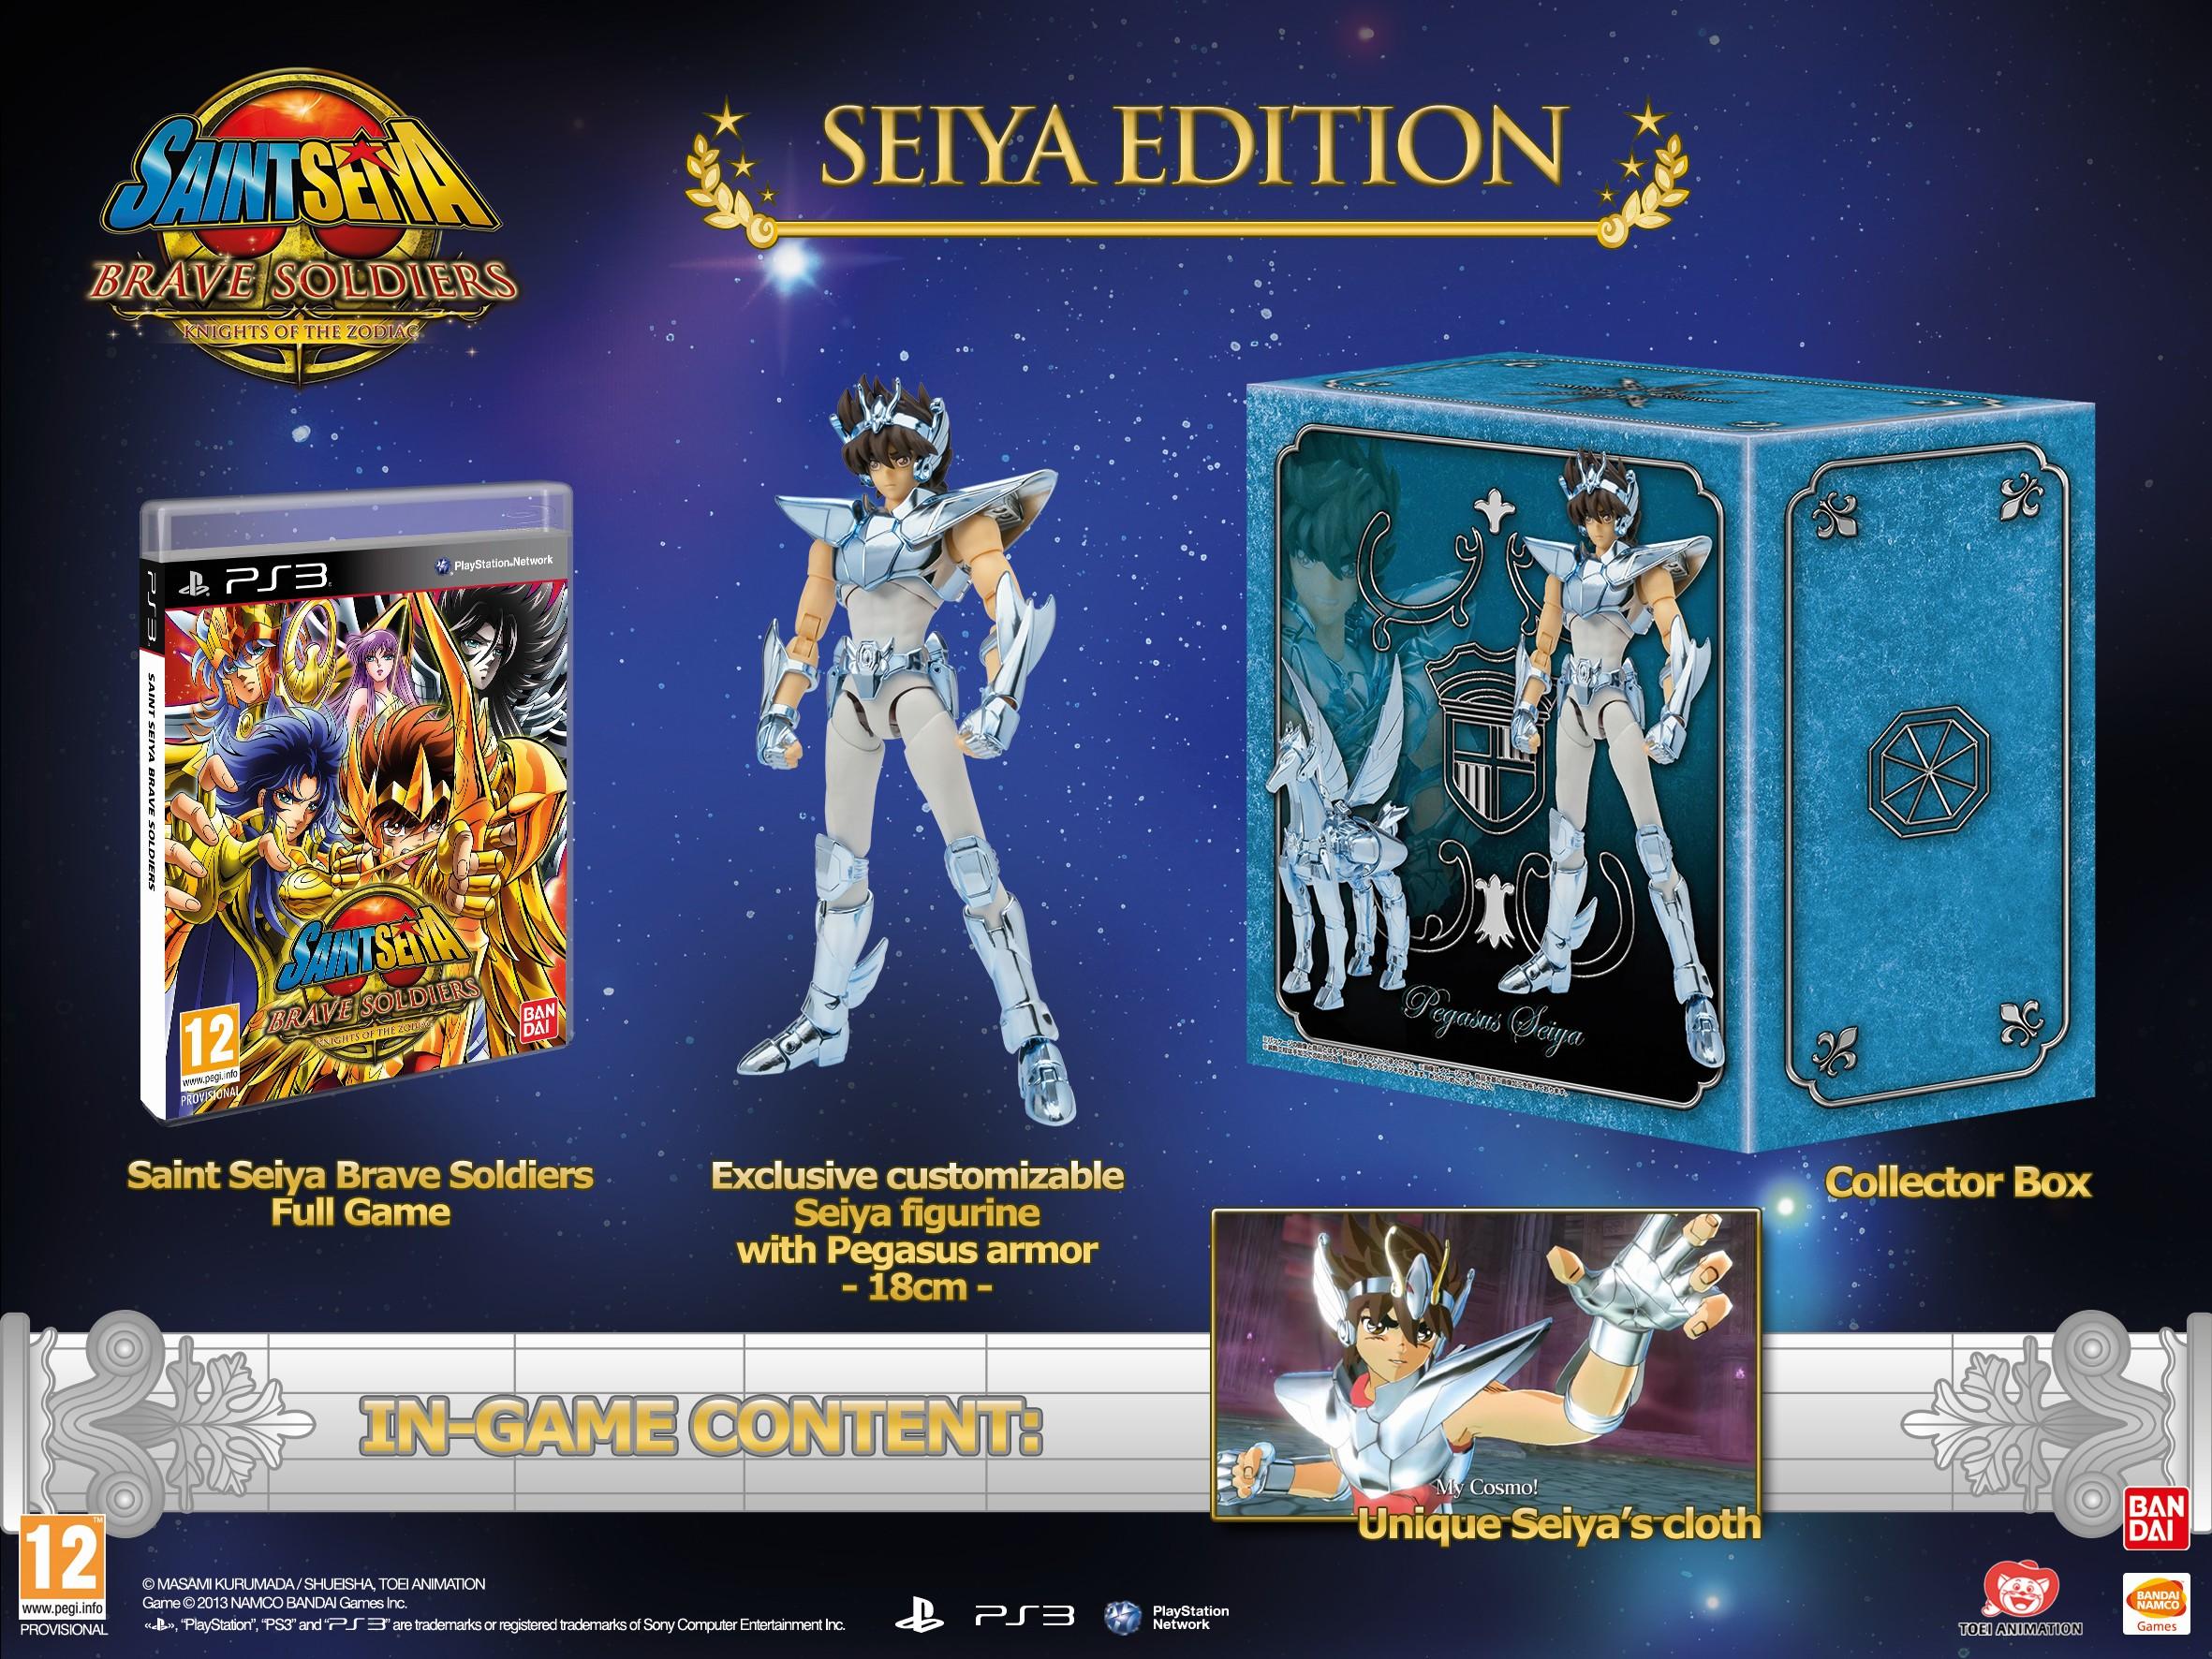 saint-seiya-brave-soldiers-seiya-edition